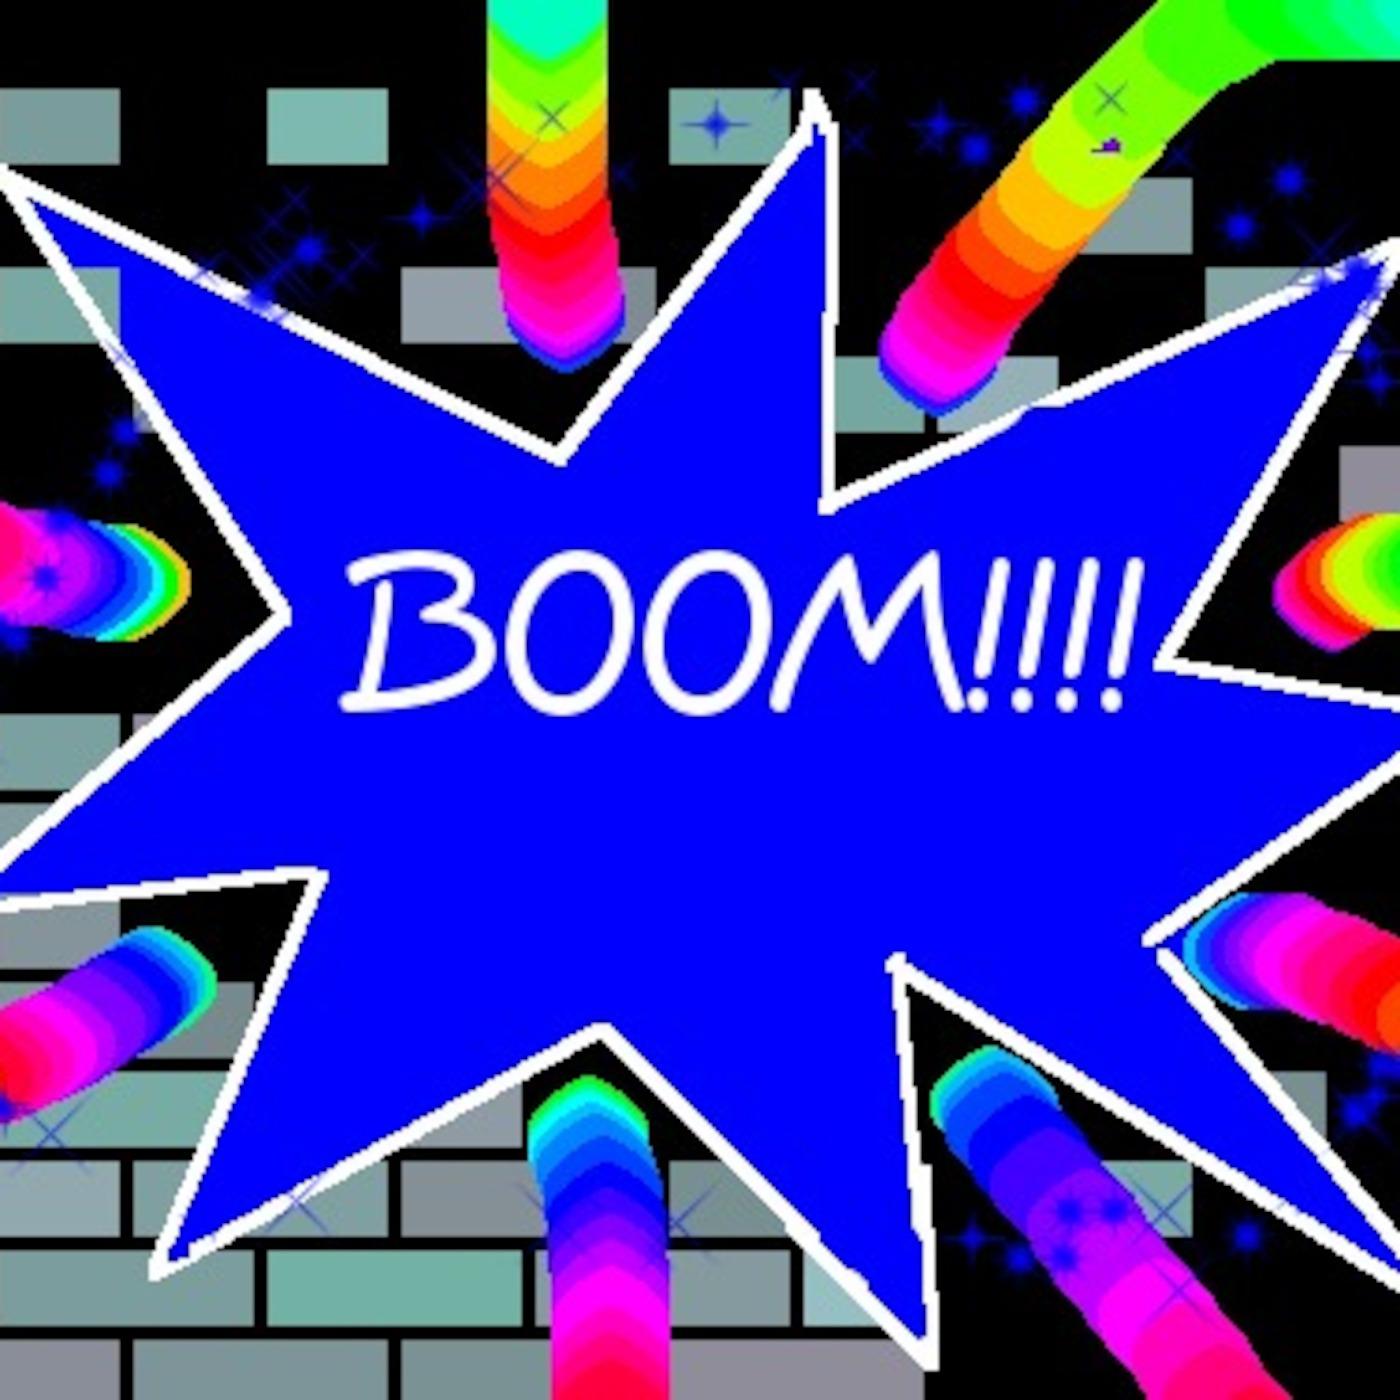 Big boom nedu wallpaper sexy videos